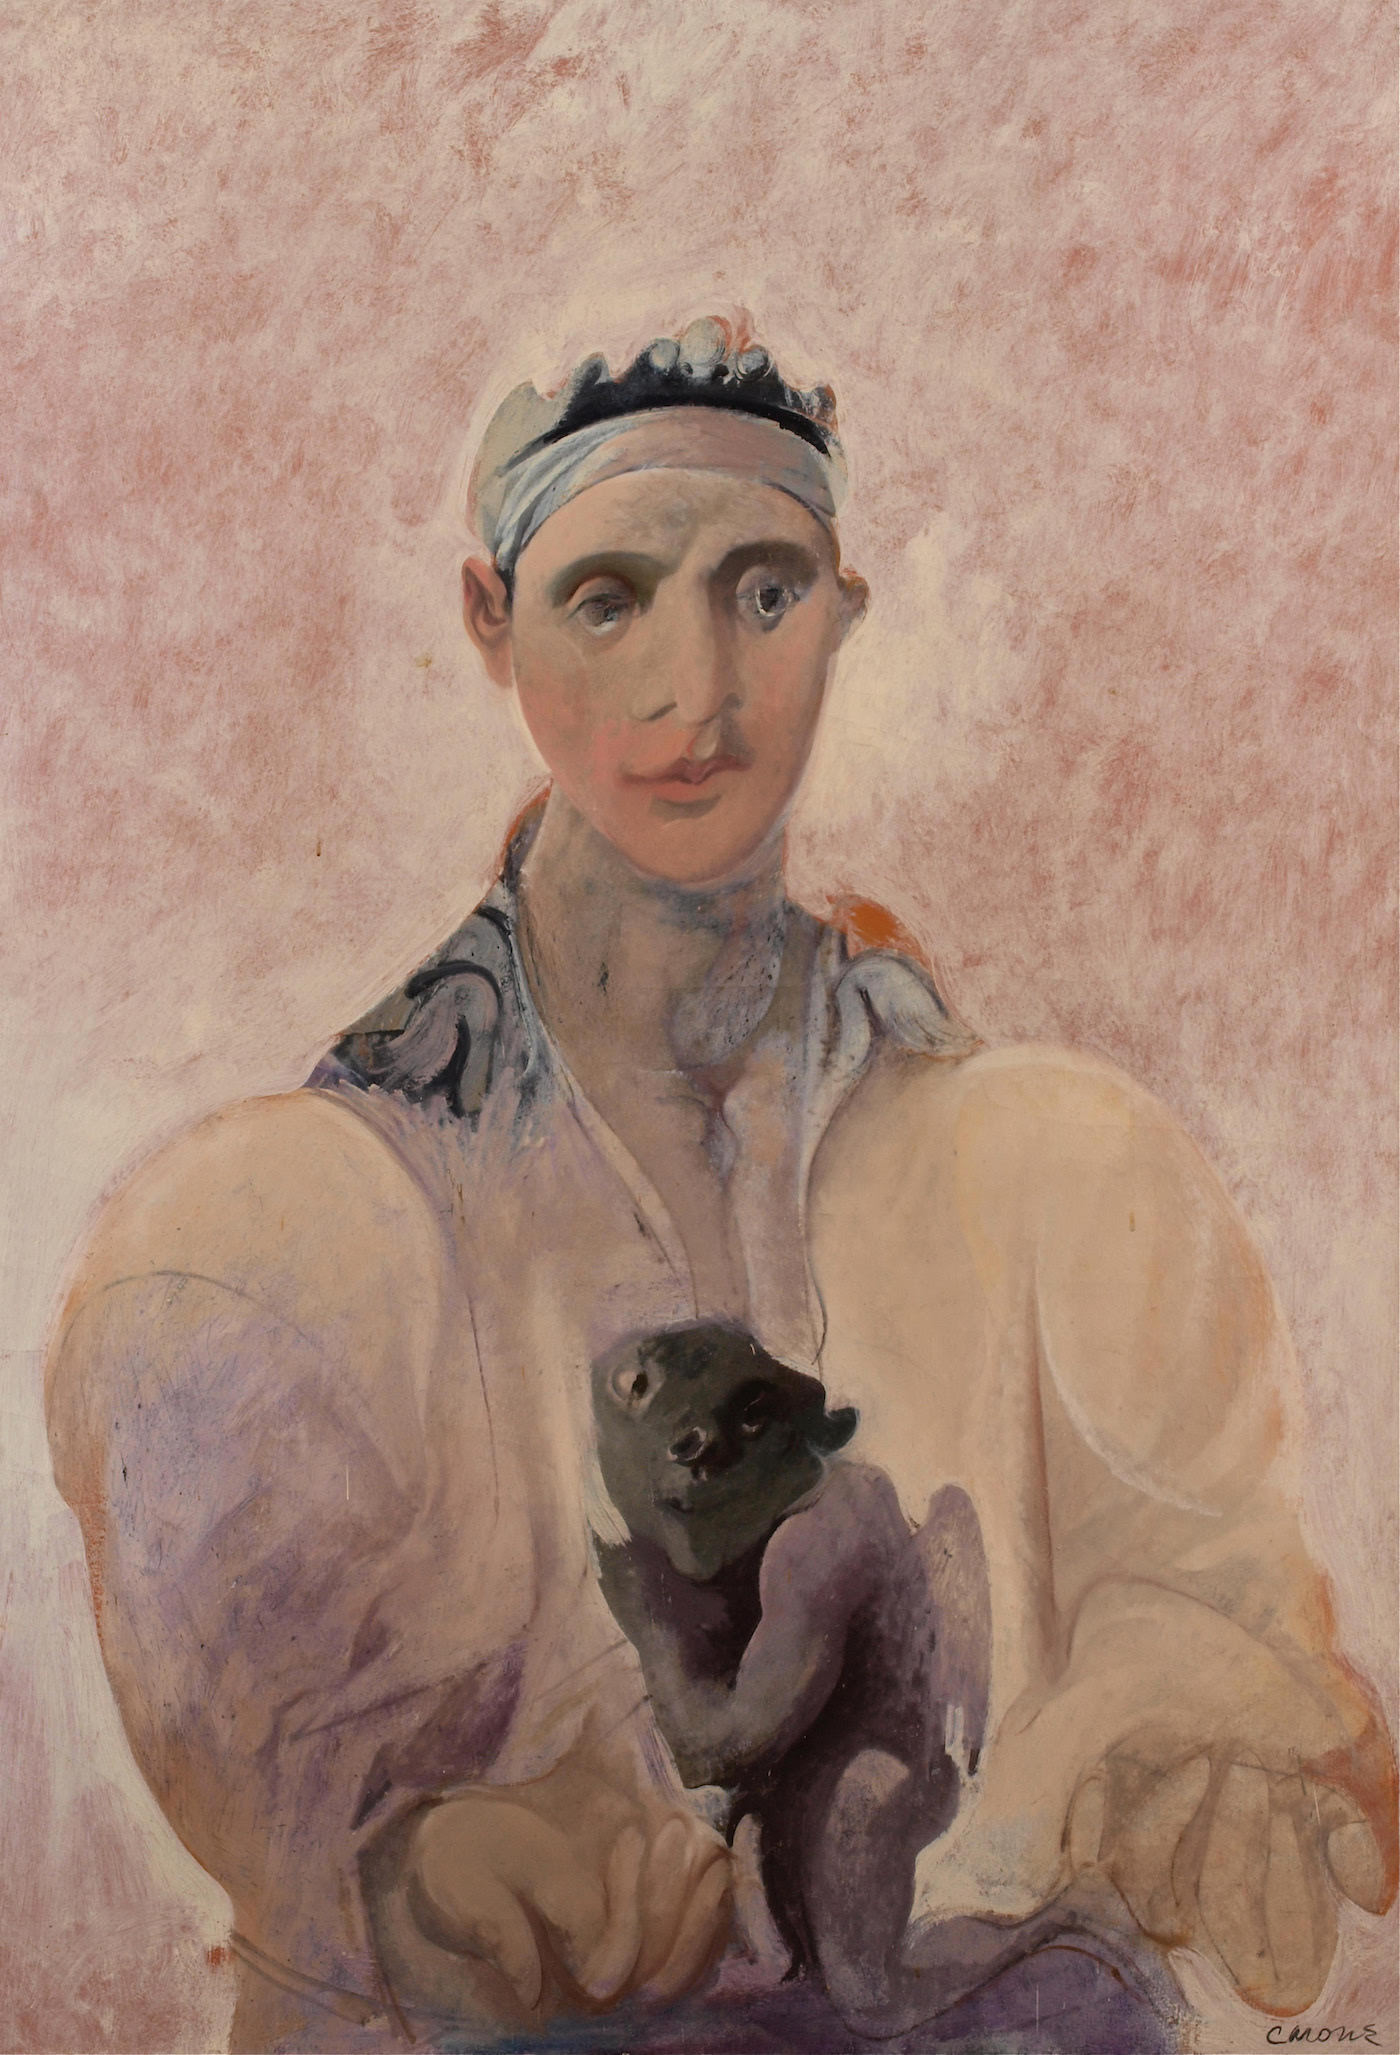 Nicolas Carone, The Prince, 1970, oil on linen, 71 1/2 x 50 inches (courtesy of Loretta Howard Gallery and the Estate of Nicolas Carone)